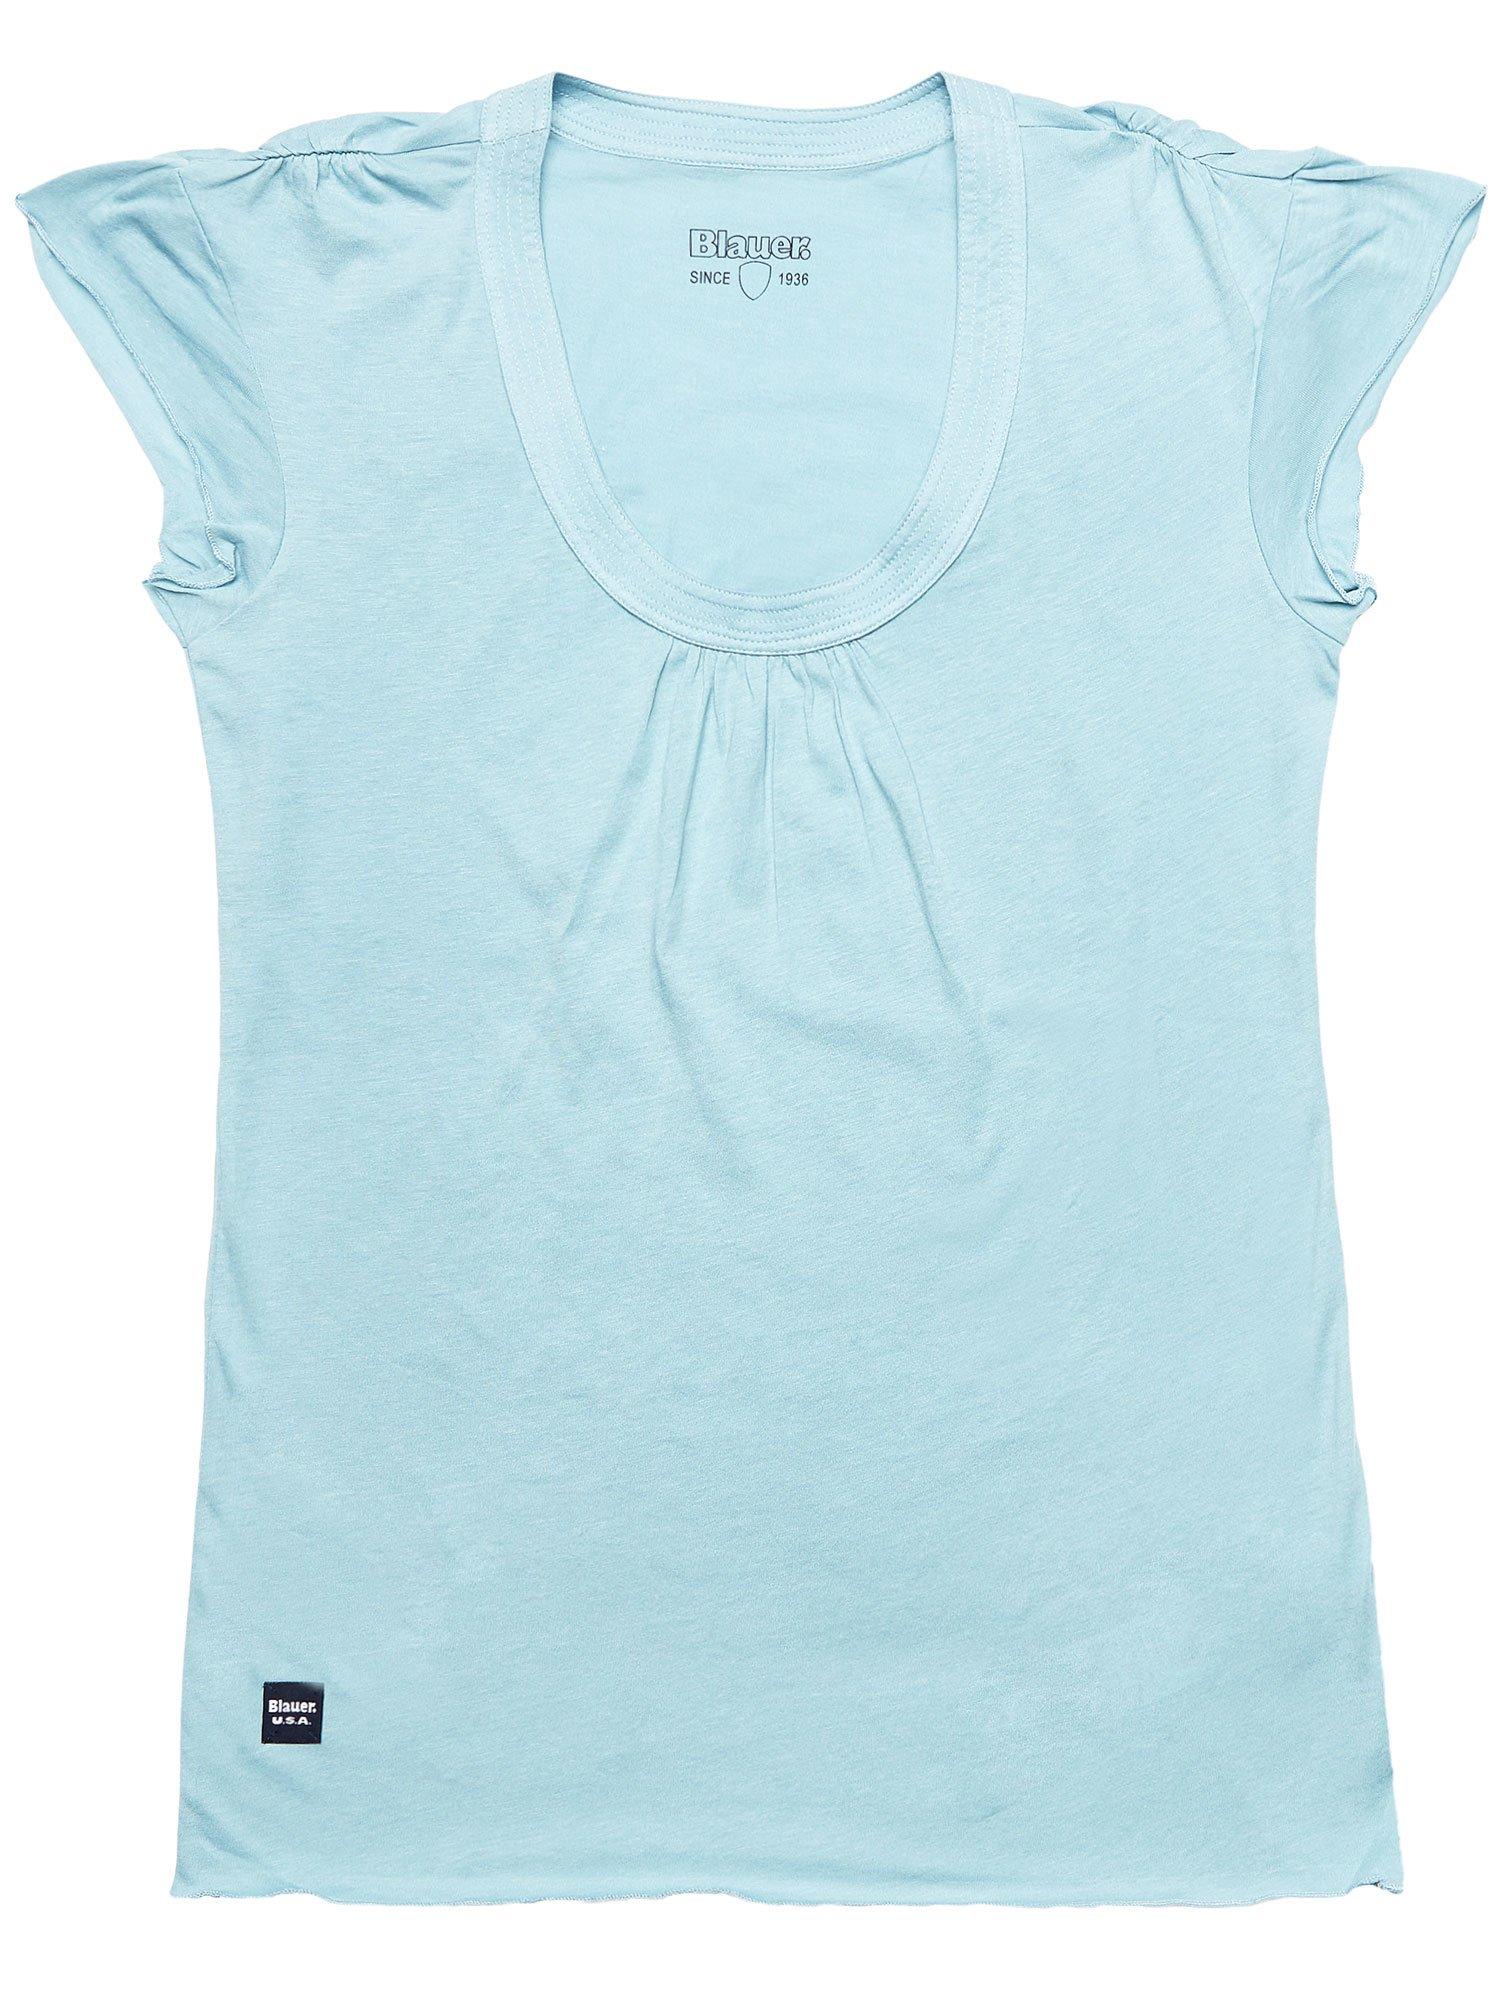 Blauer - CAP SLEEVE T-SHIRT - Blue Dolphin - Blauer